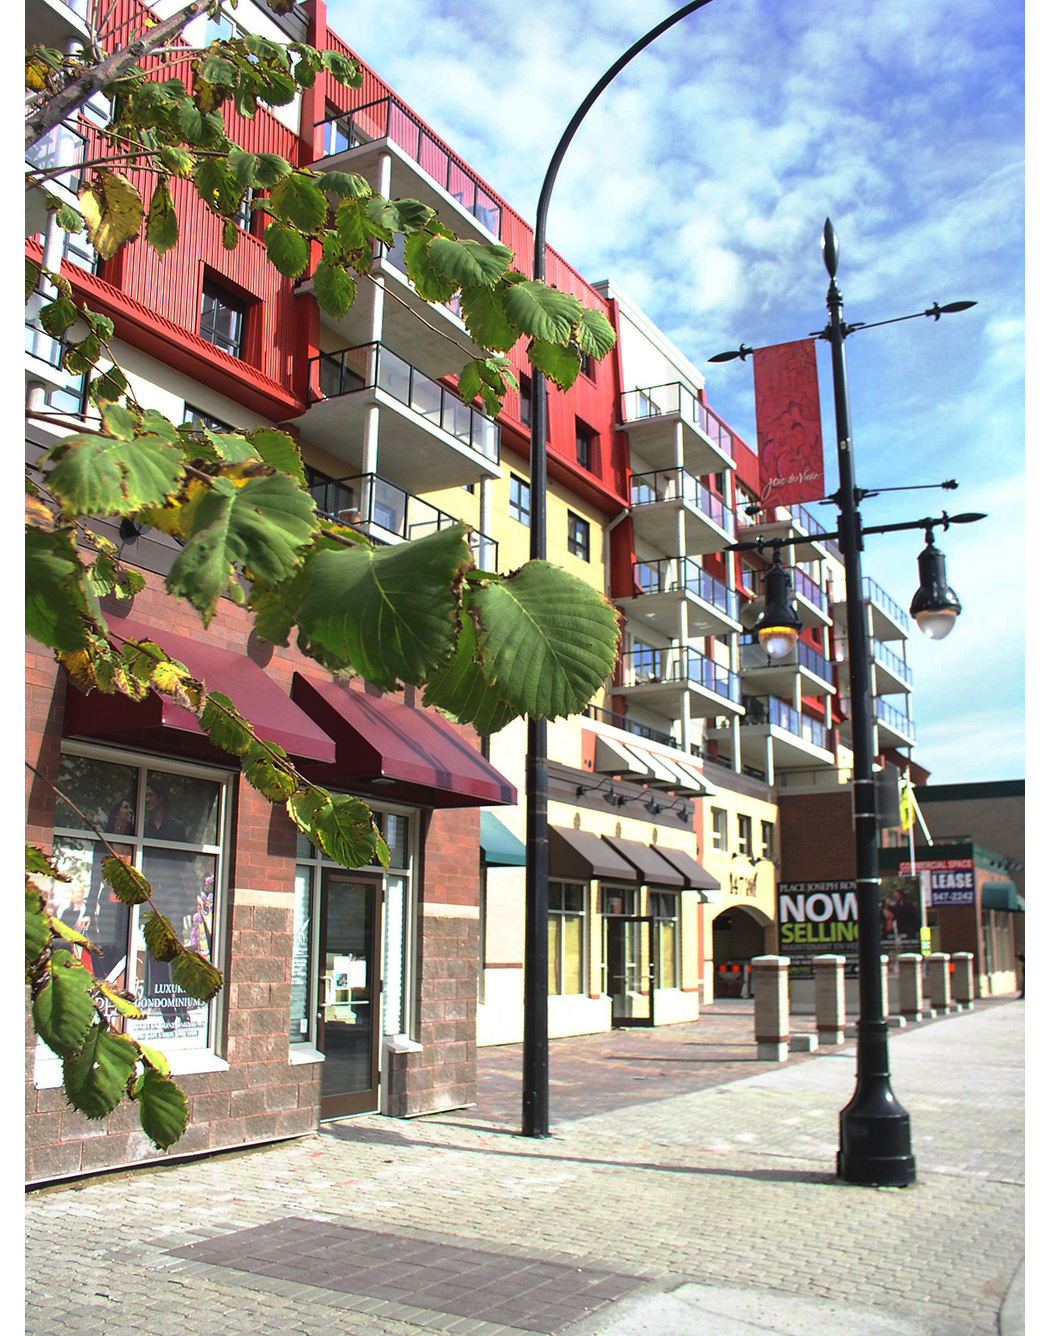 Place Joseph Royal Condominiums, exterior photo of building